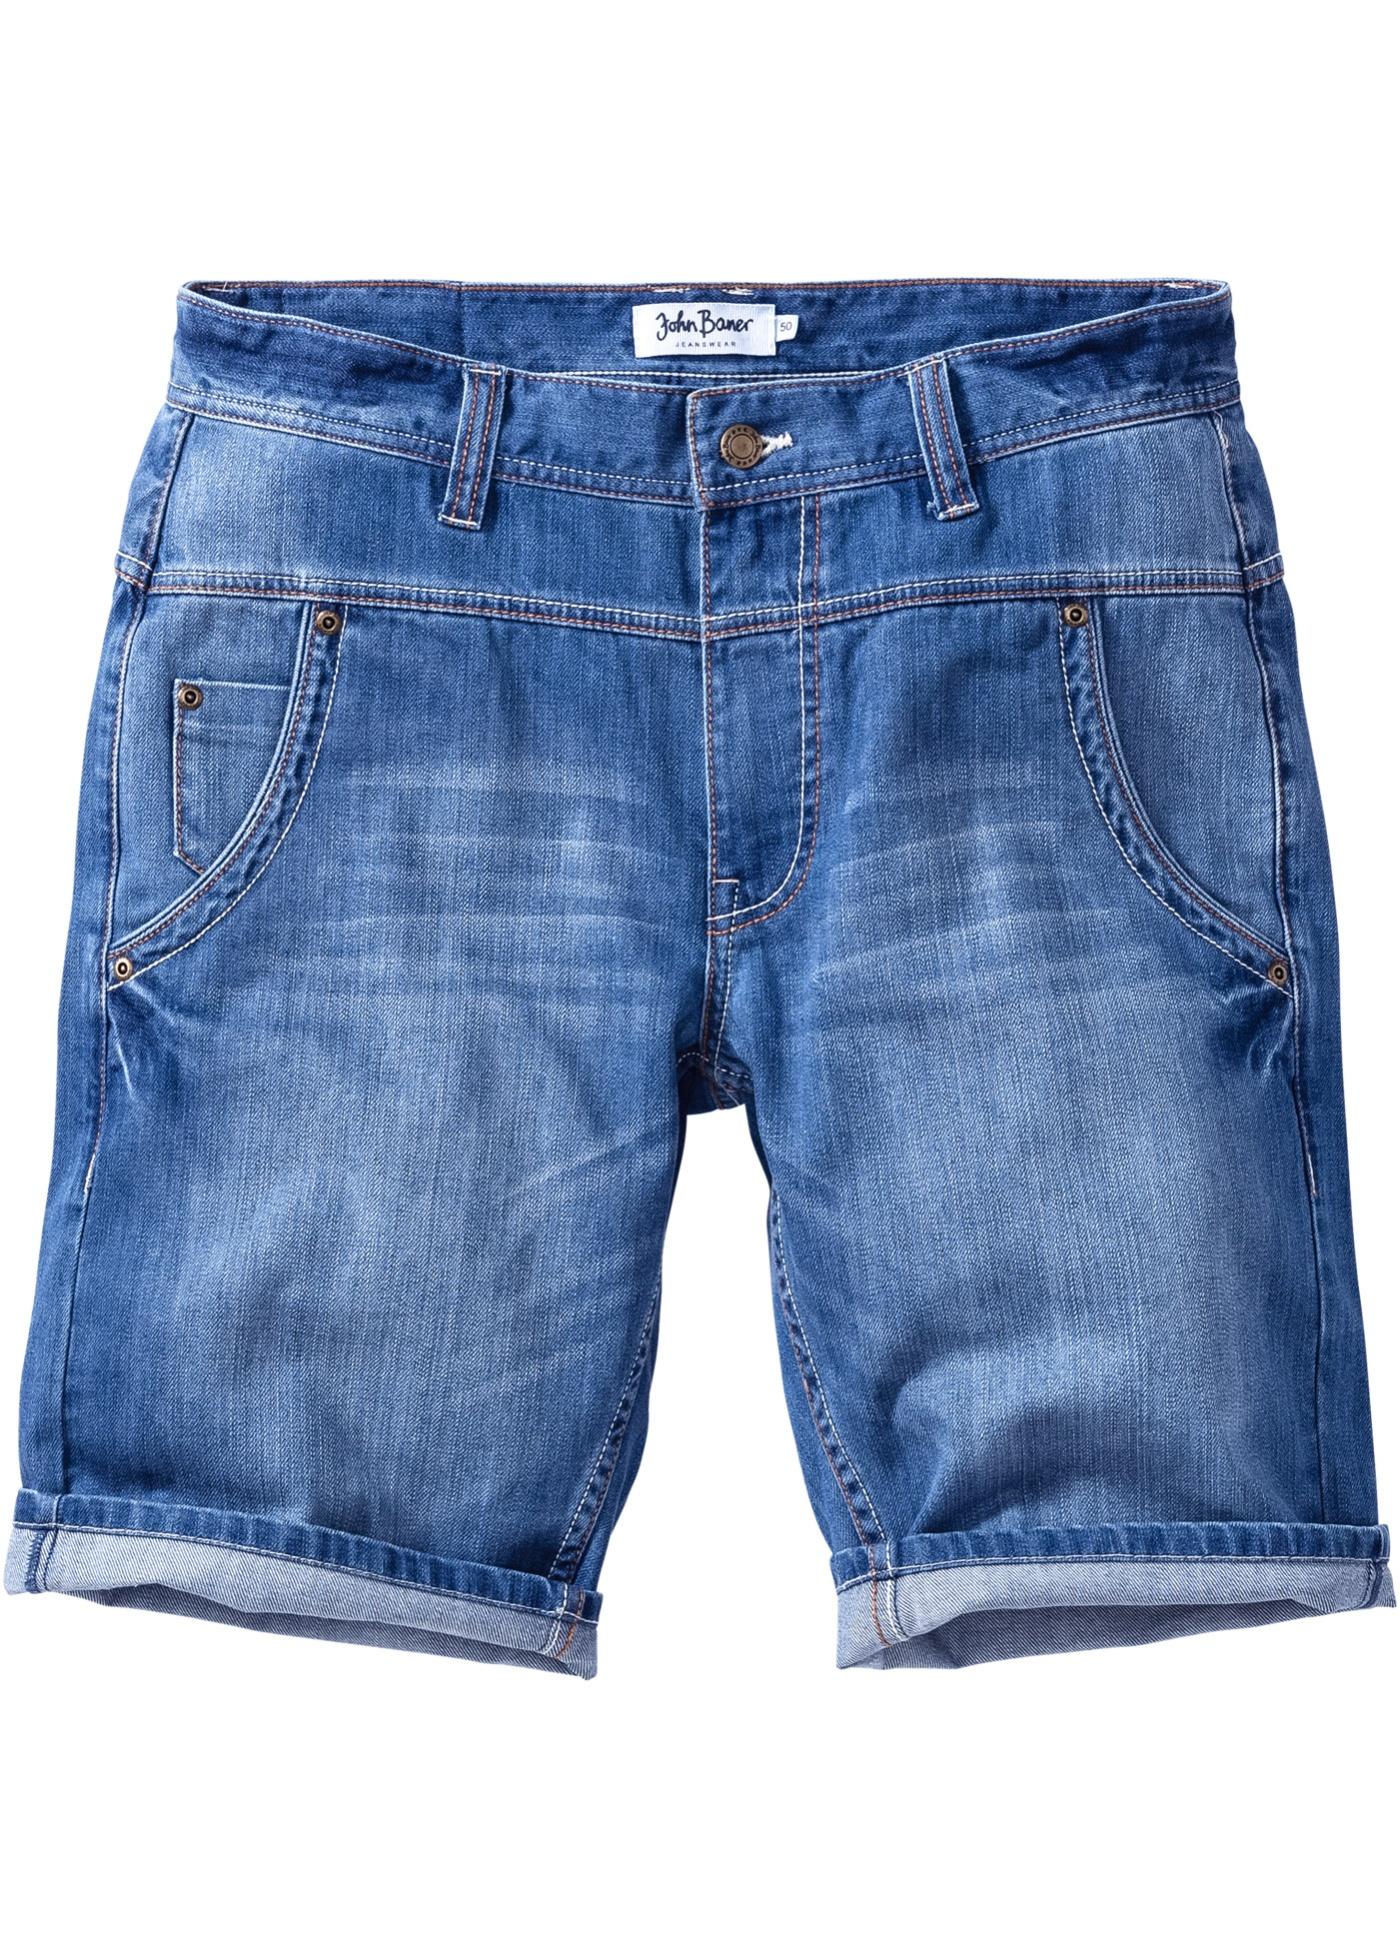 Bermuda di jeans loose fi